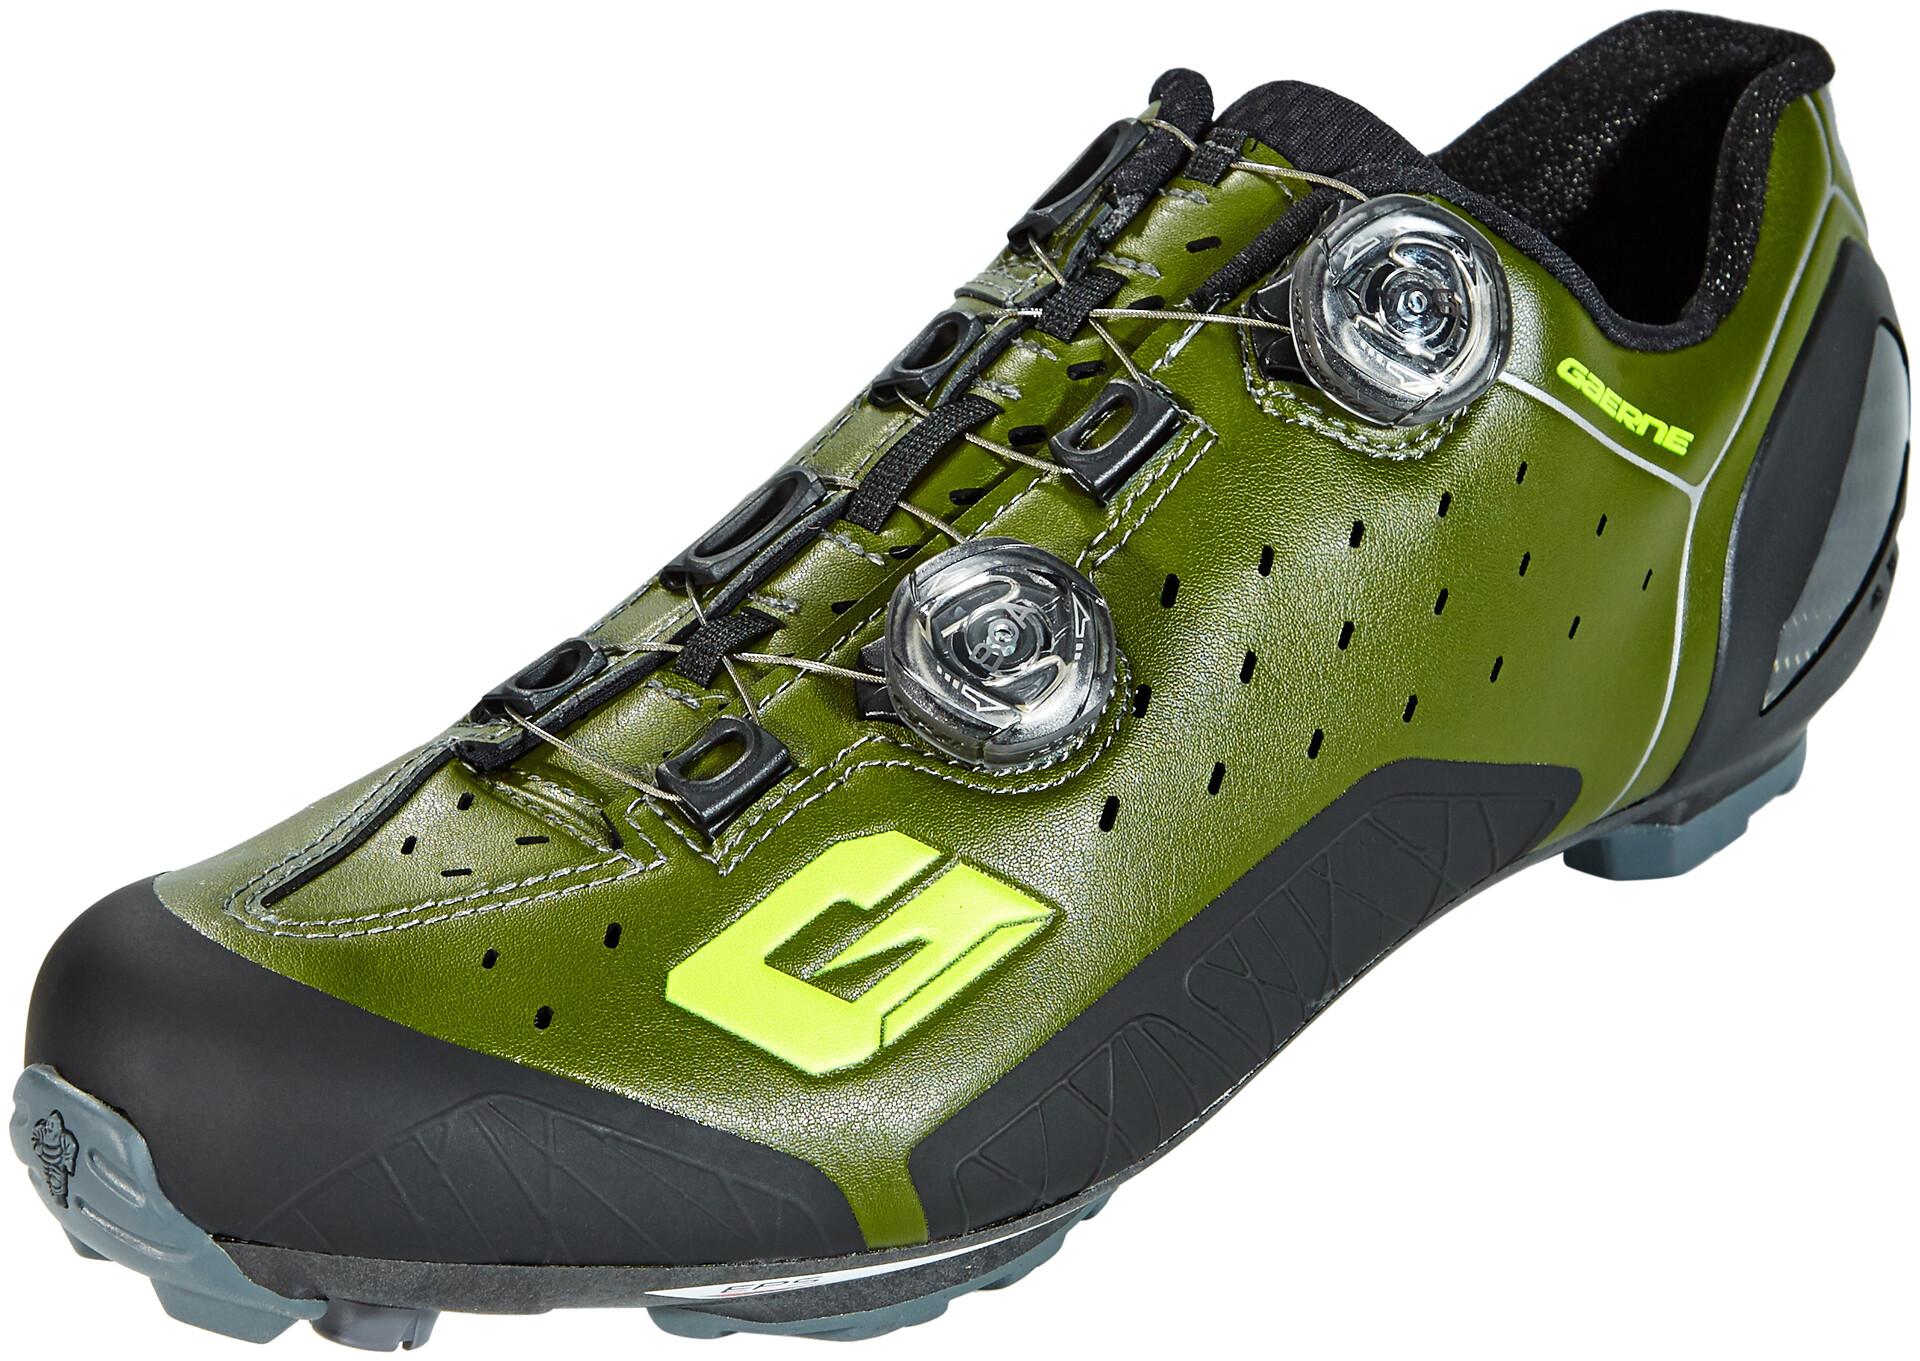 Gaerne Carbon G.Sincro Zapatillas ciclismo Hombre, forest green